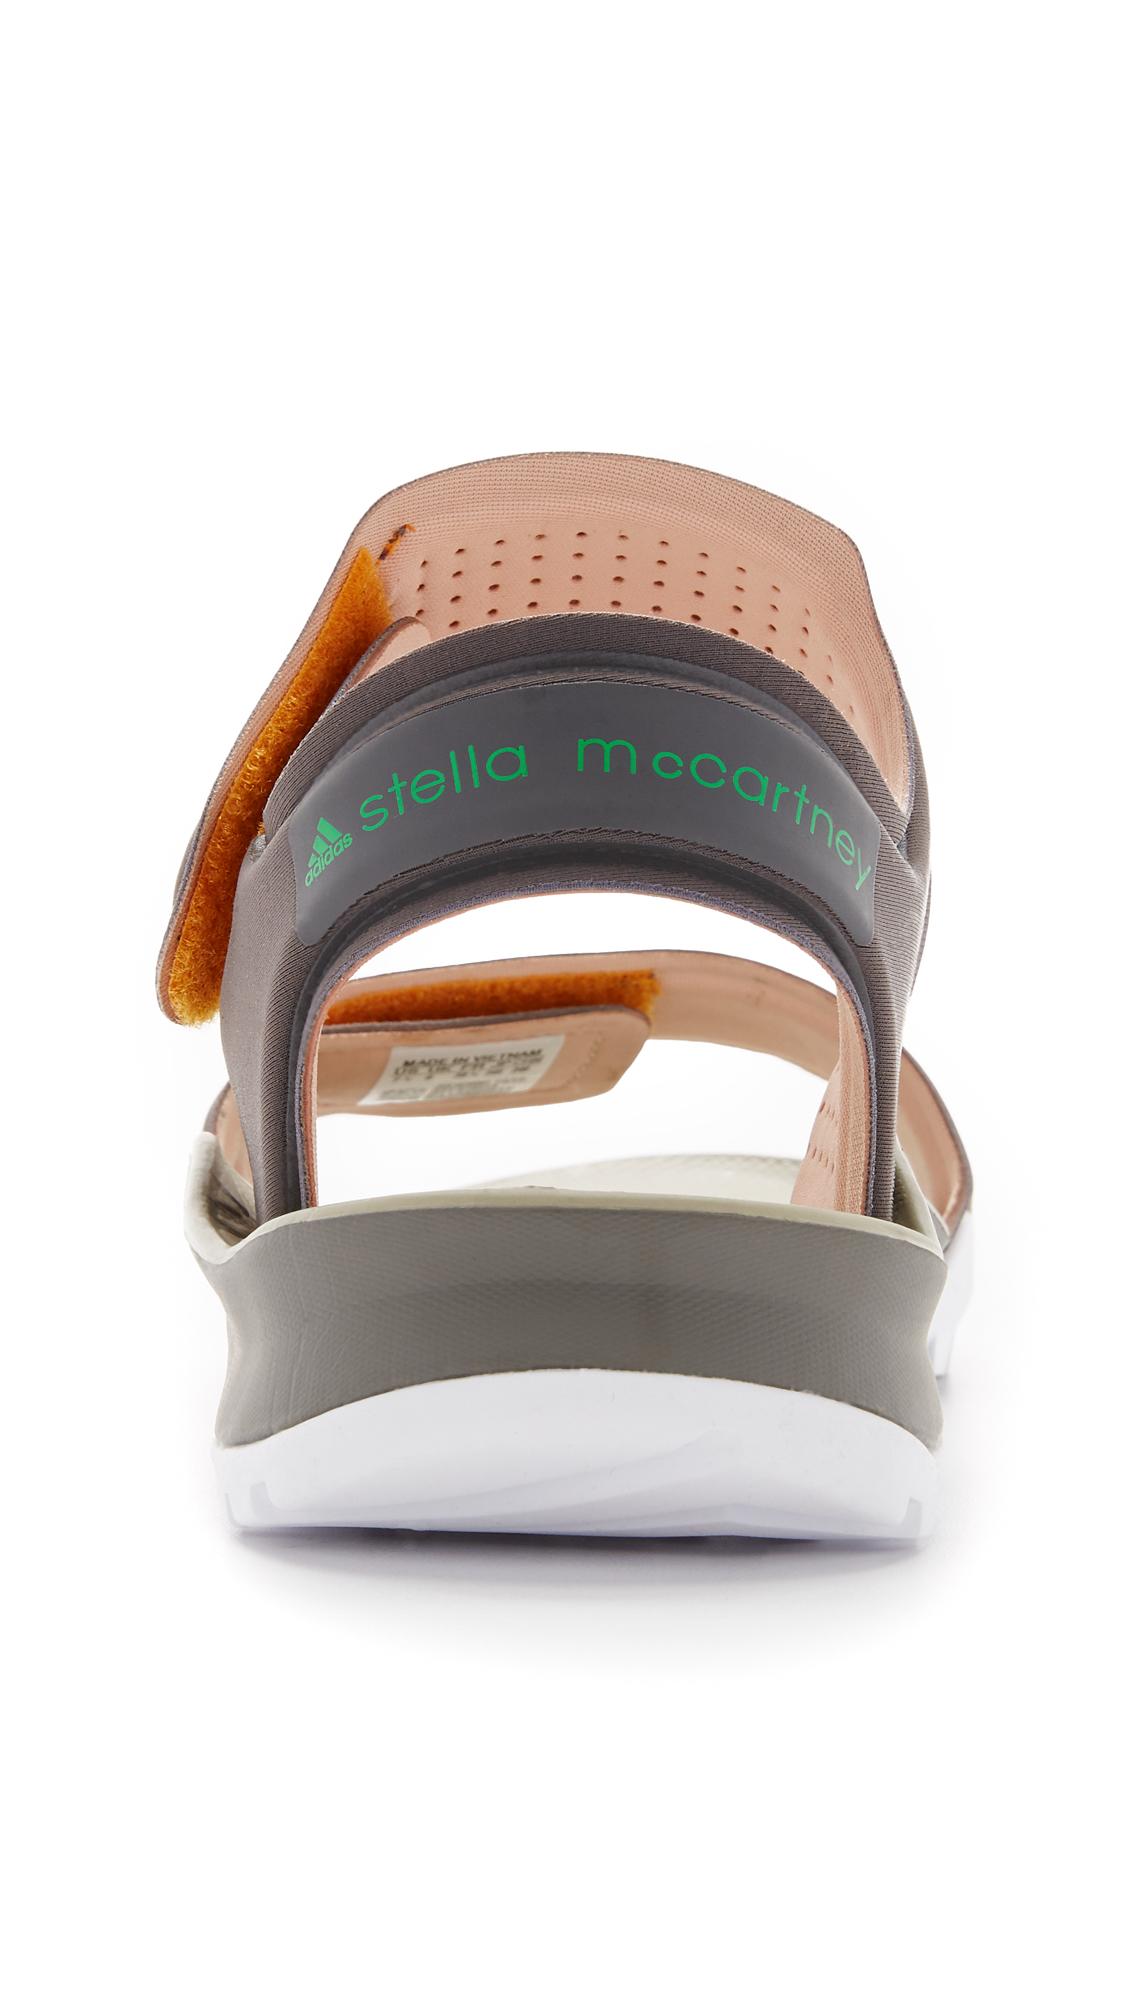 42819e041e18 Lyst - adidas By Stella McCartney Hikira Sandals in Gray